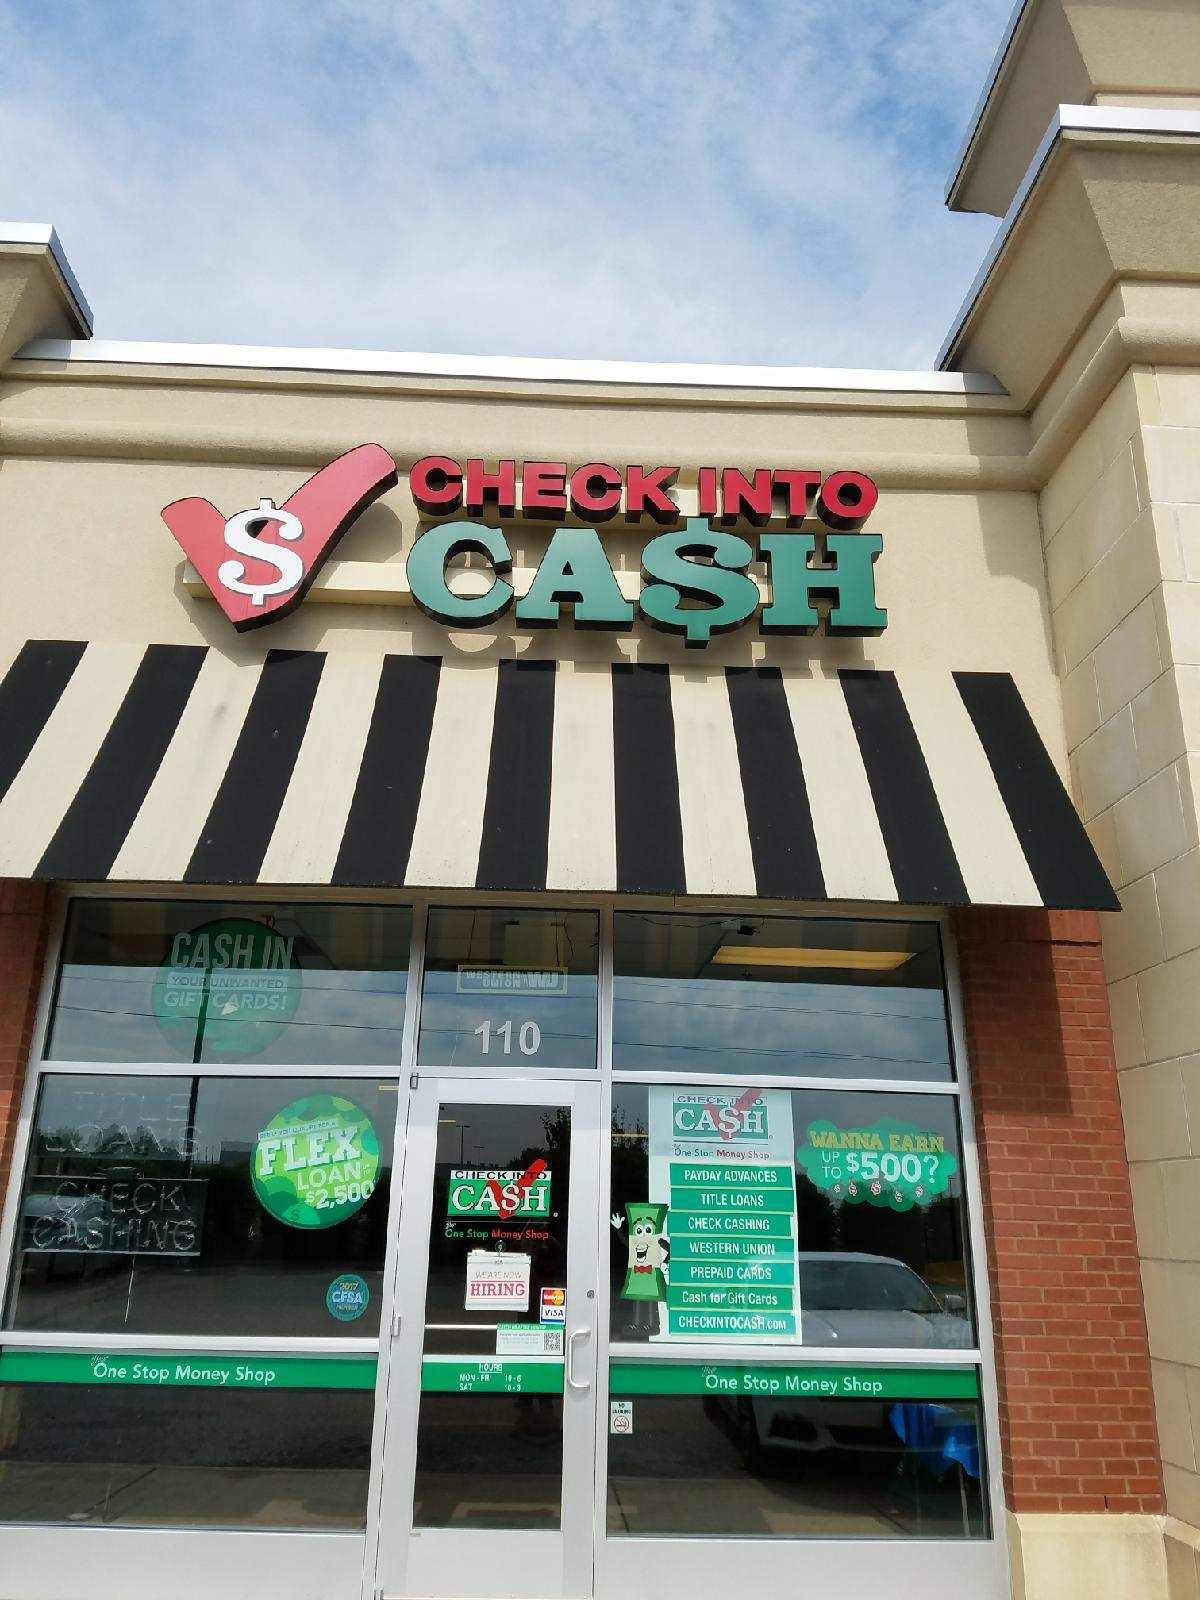 $830 Fast Payday Loans no Credit Check